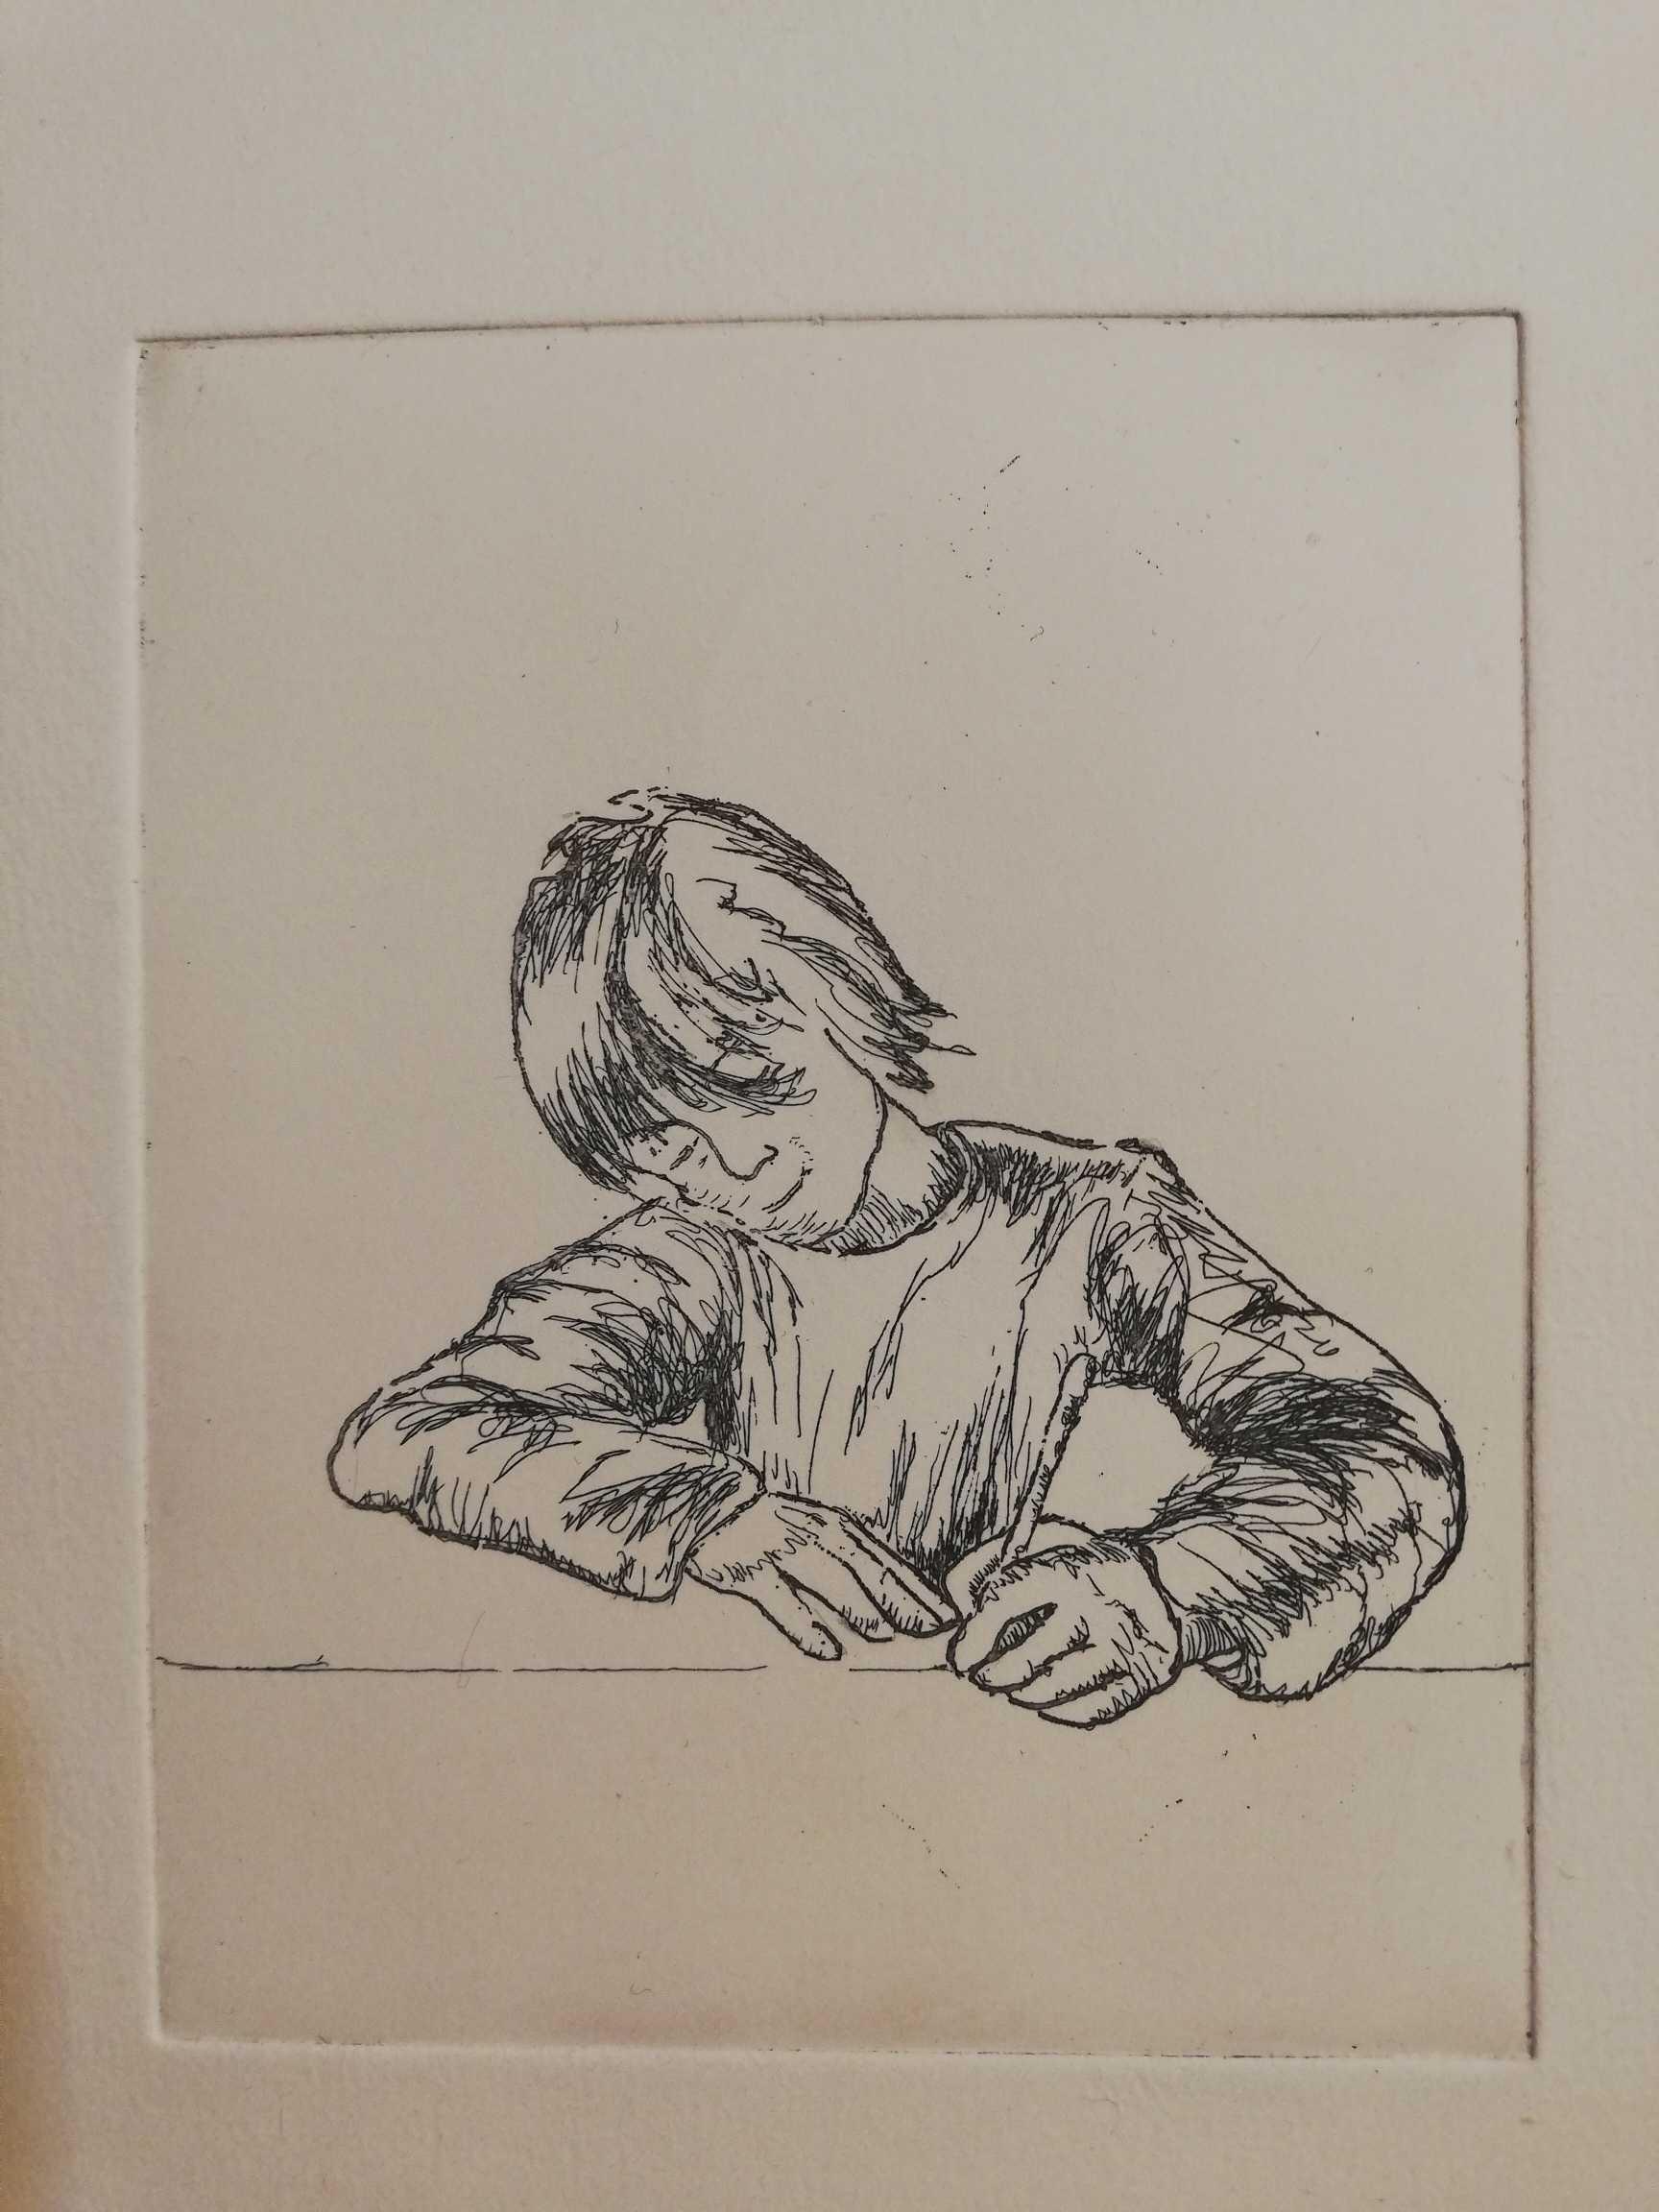 Trace Blanche engrave by Michel Puharré 2015